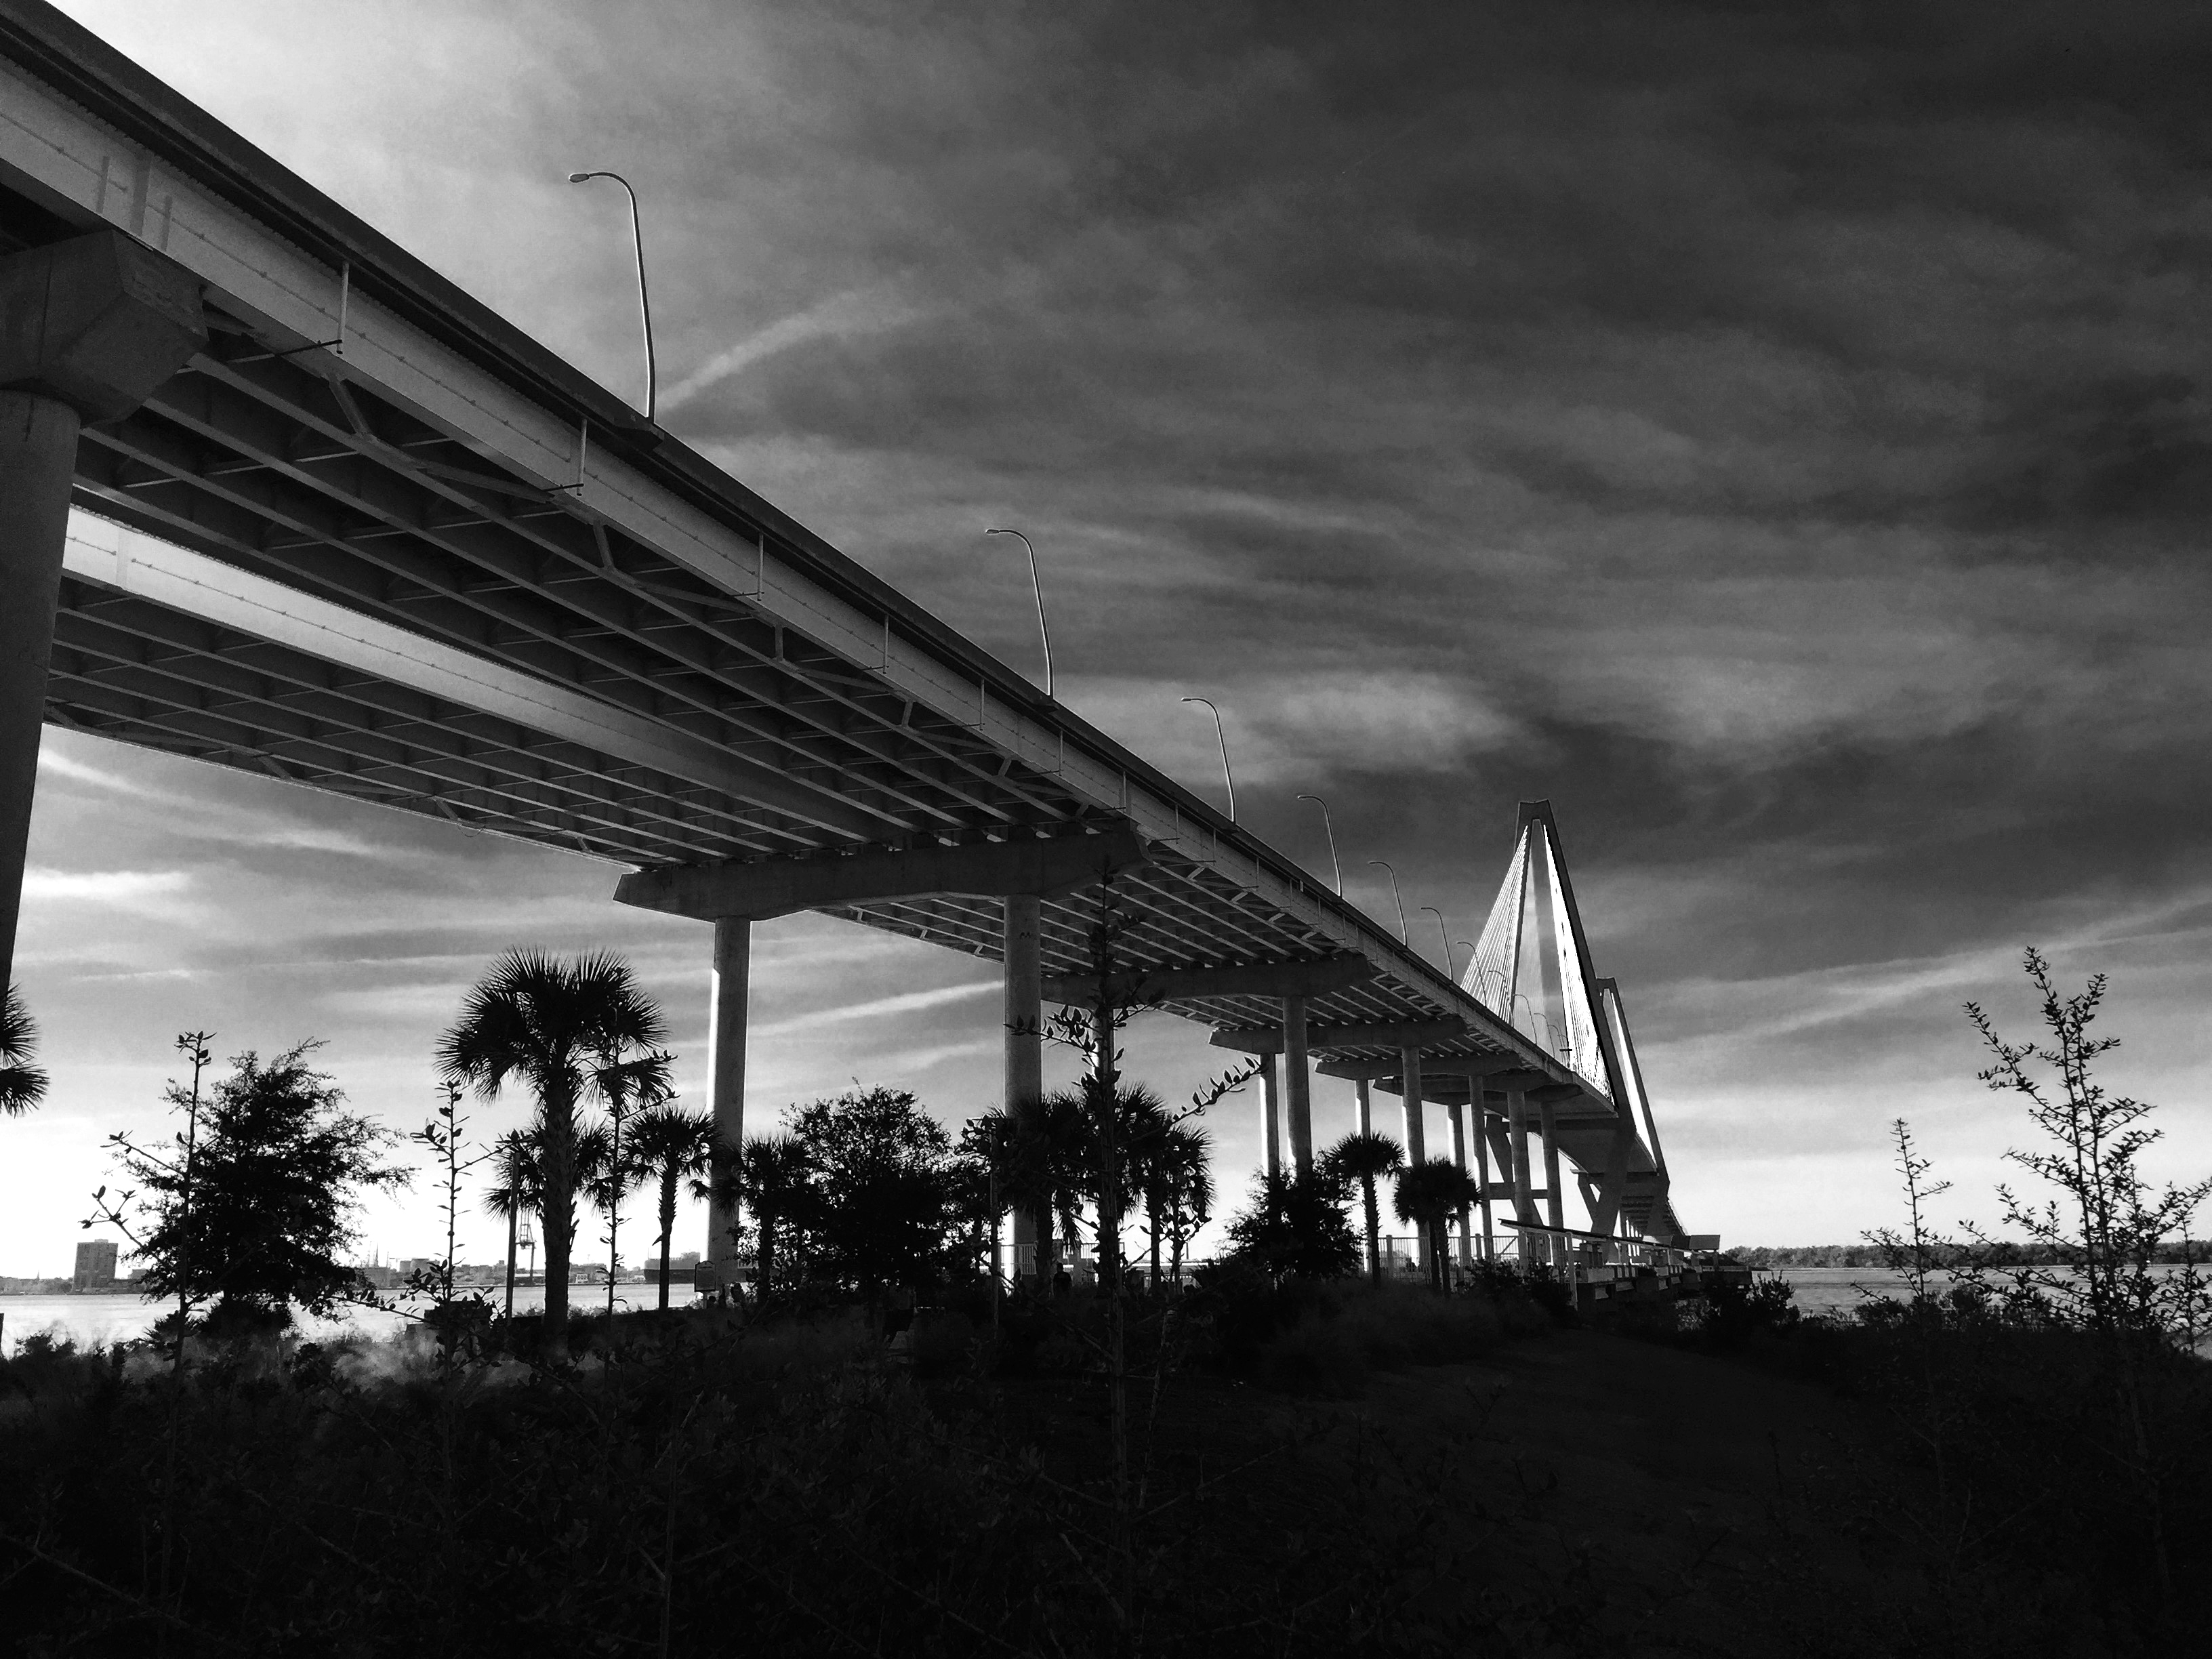 Under Ravenel Bridge